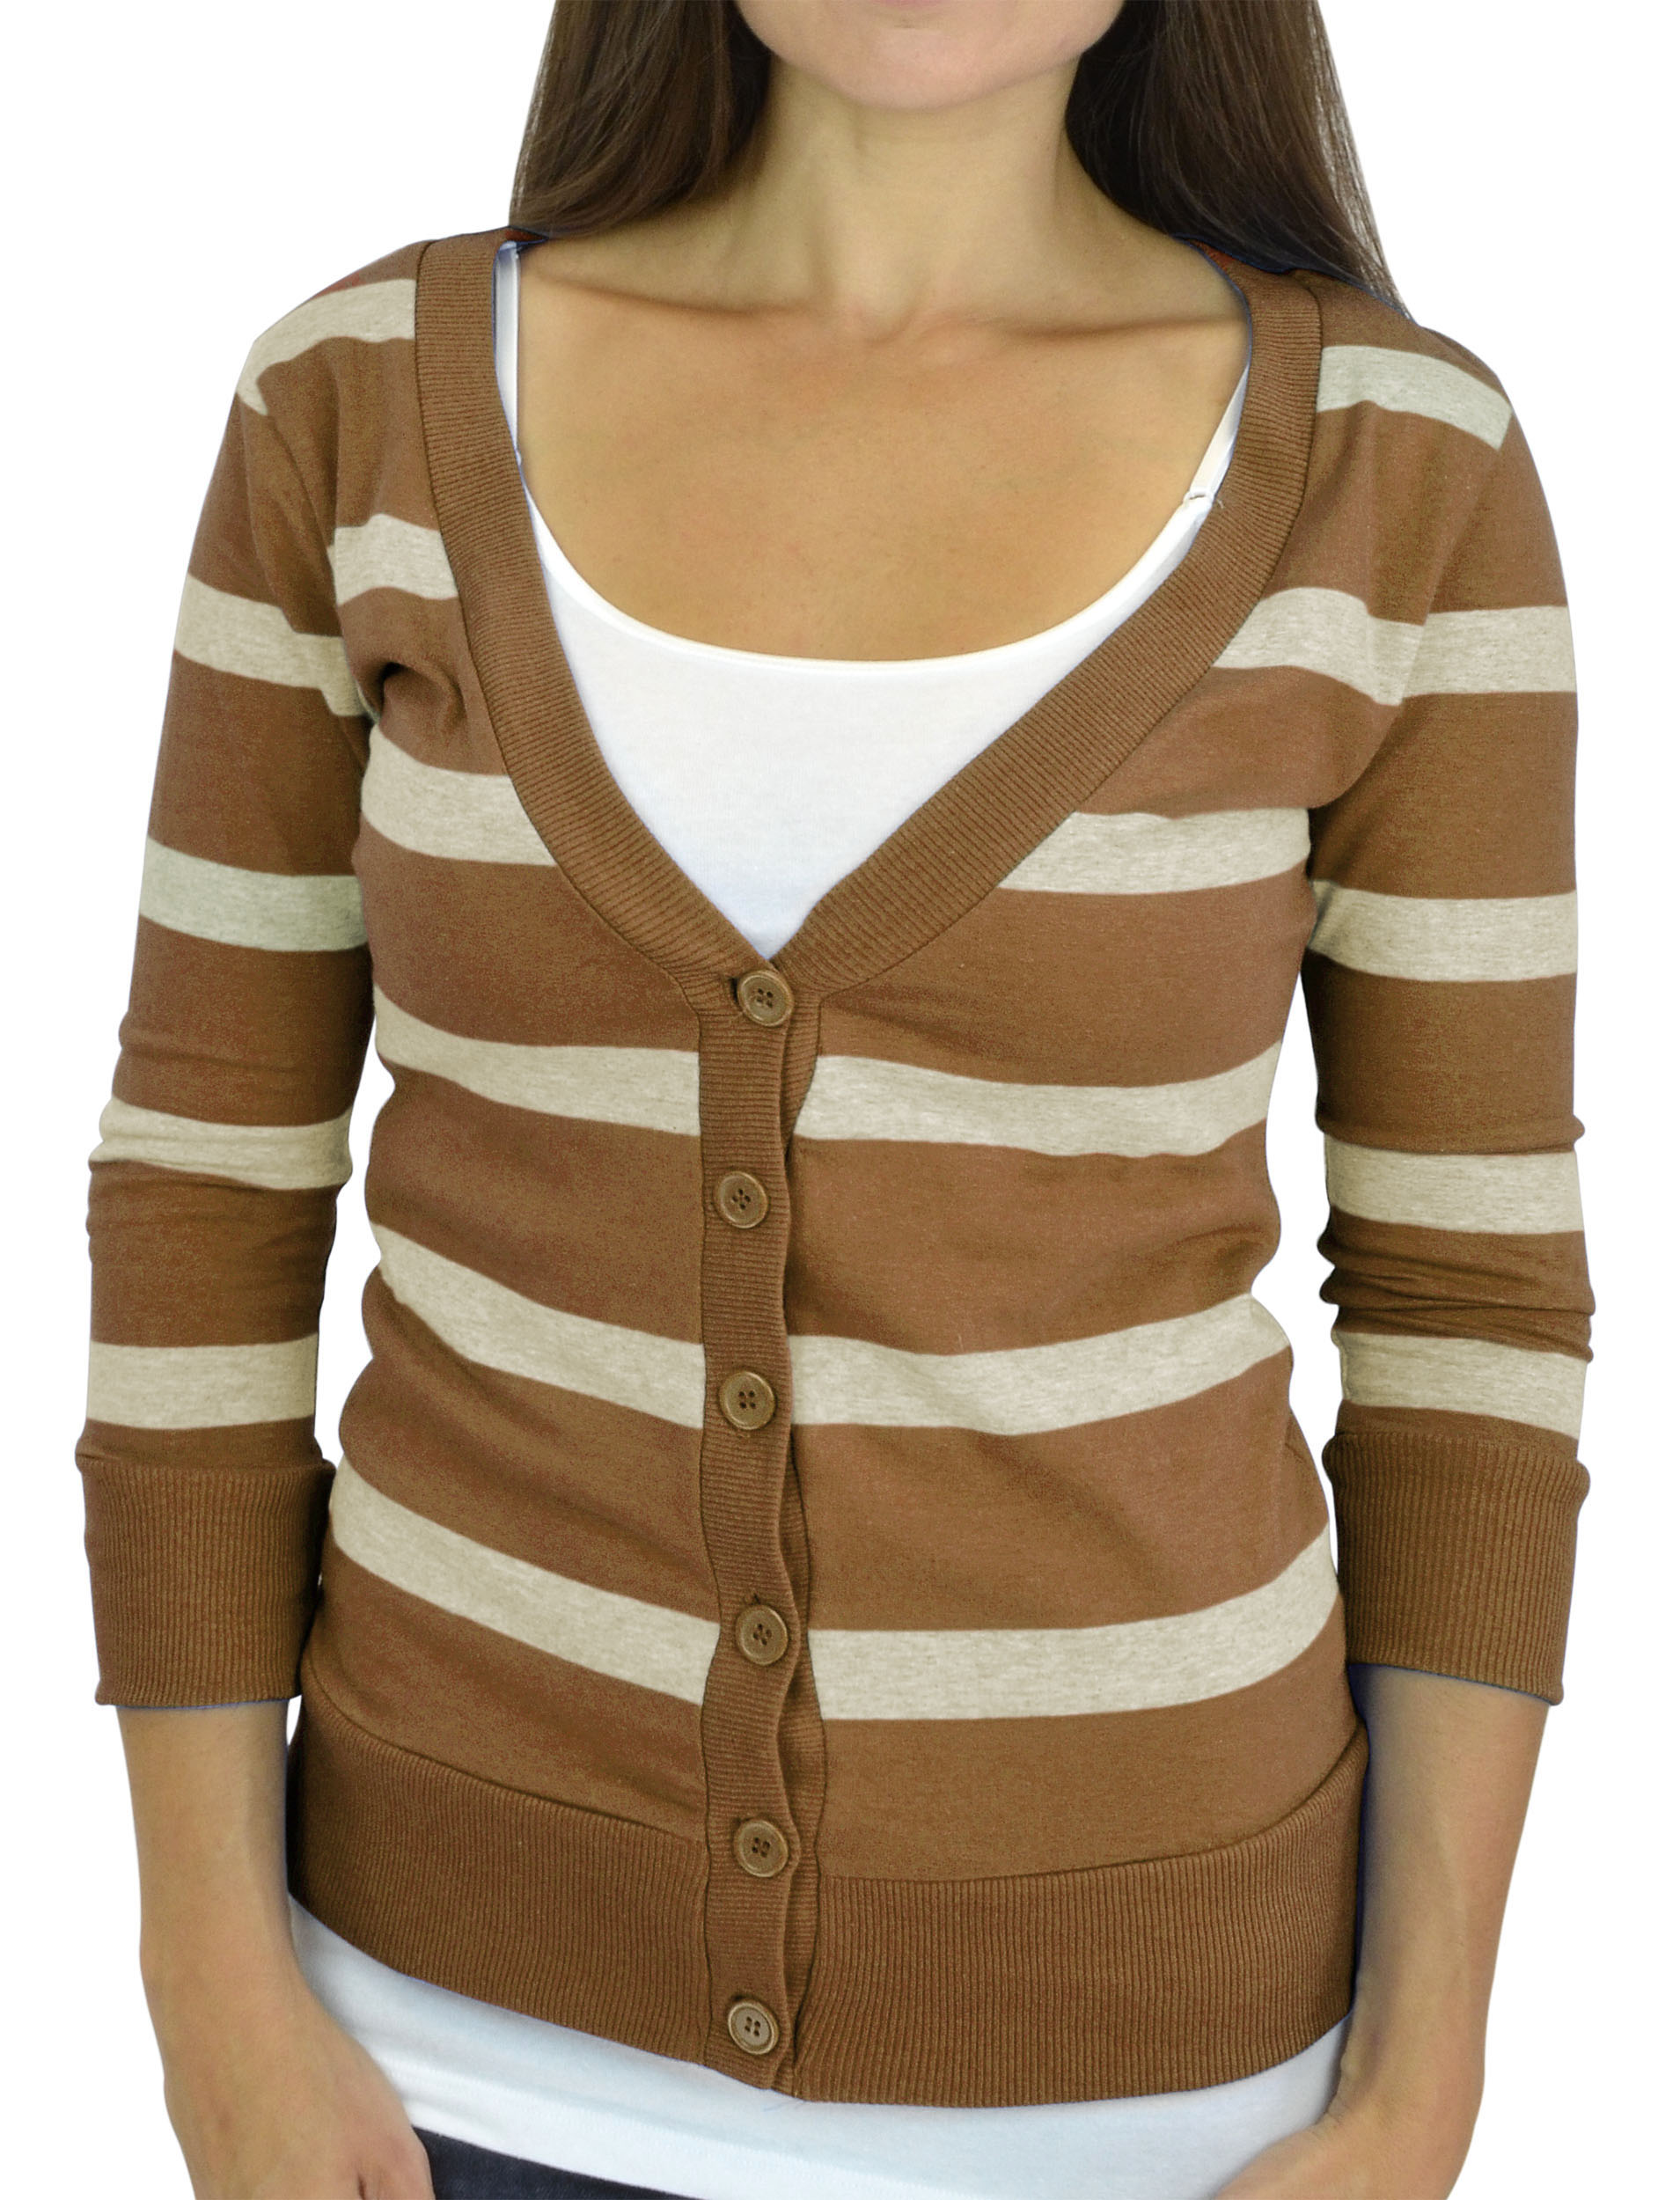 Belle Donne - Women / Girl Junior Size Soft 3/4 Sleeve V-Neck Sweater Cardigans - Heather Beige/Medium